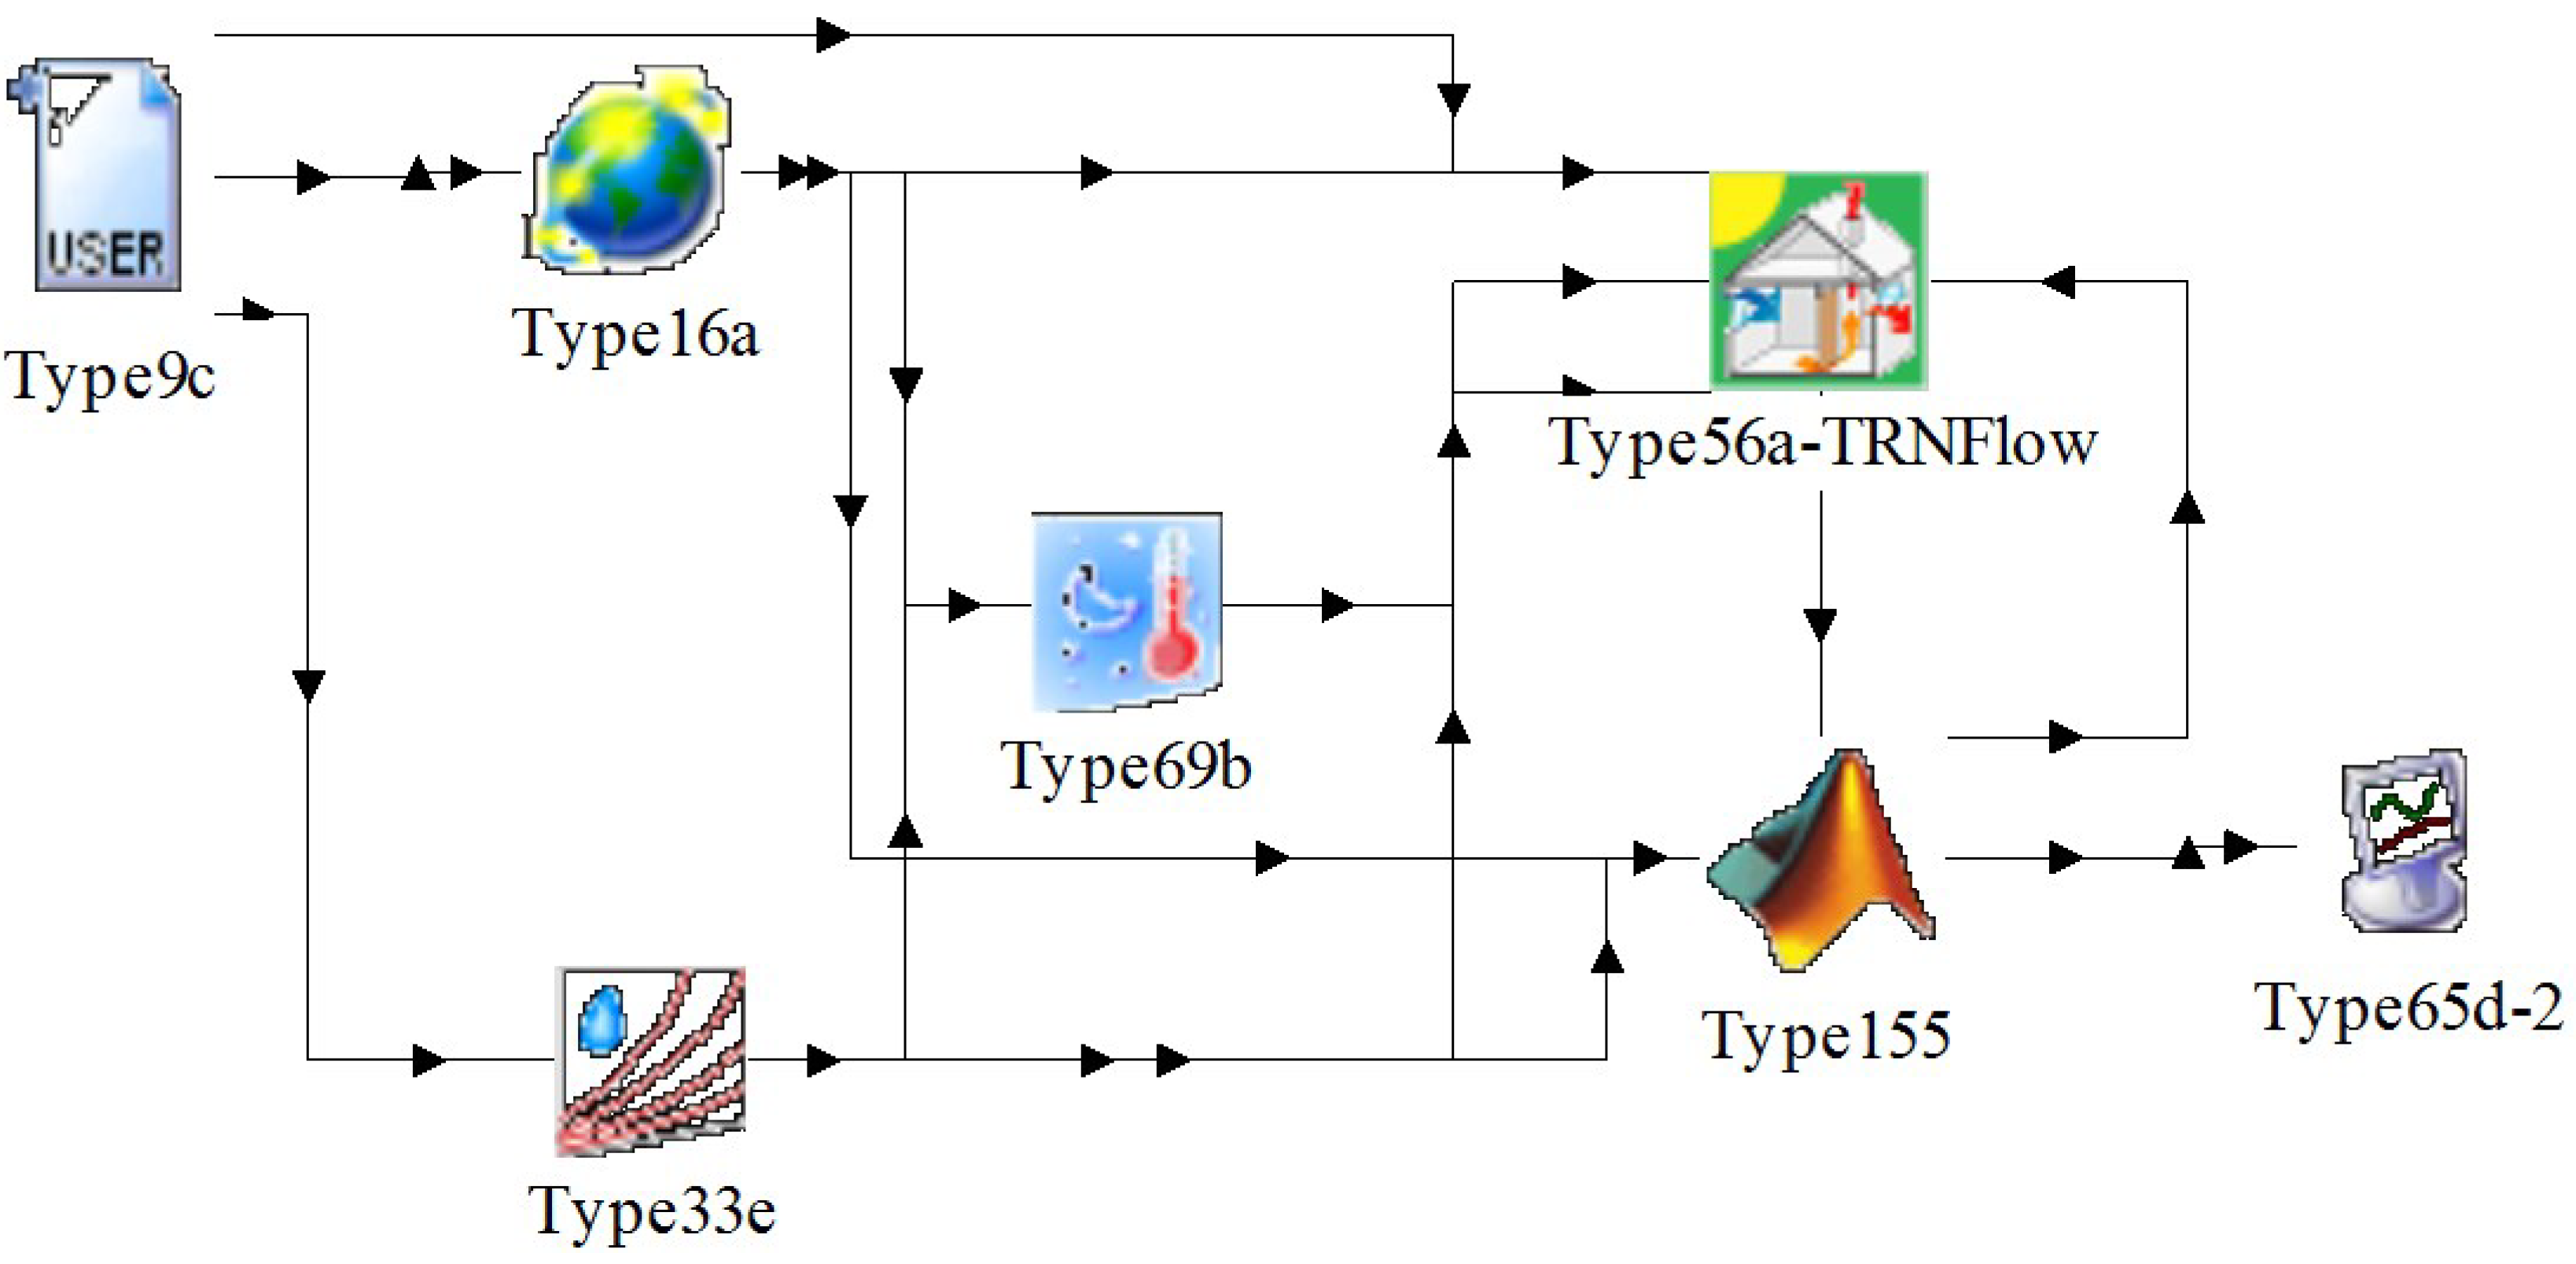 Network Based Temperature Control for Optimum Operation of Building #BCBA0F